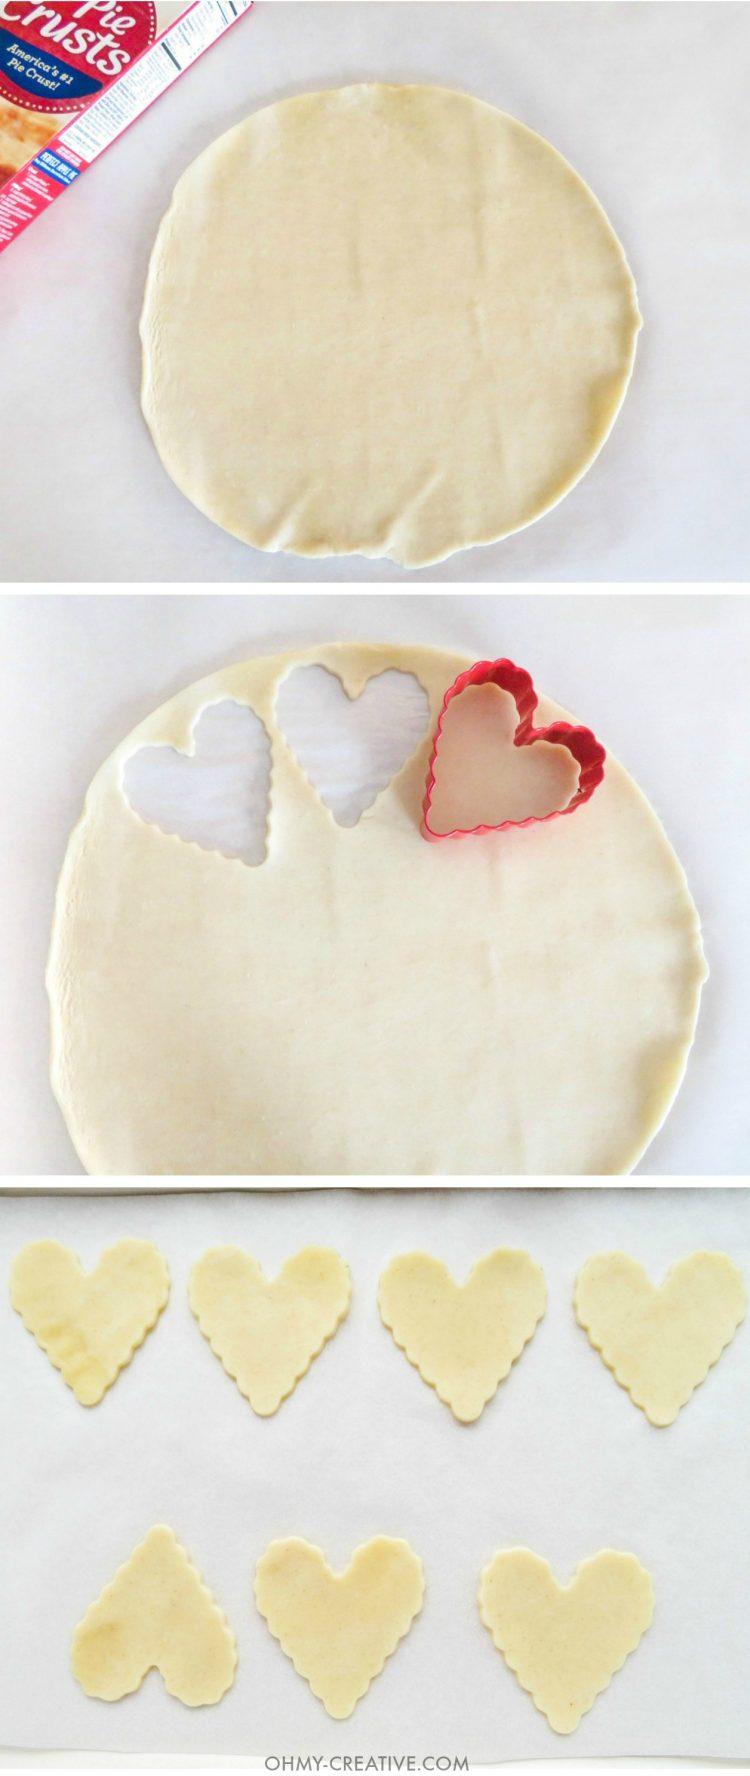 Mini Cherry Pies - Heart Pie Pops - A sweet Valentine's Day Treat! OHMY-CREATIVE.COM   Heart Shaped   Valentine's Day Dessert   Pie Pops   Pie Crust   Cherry Pie   Pillsbury Pie Crust   Premade Pie Crust   Sprinkles   Handheld pies   Mini Pies   Heart